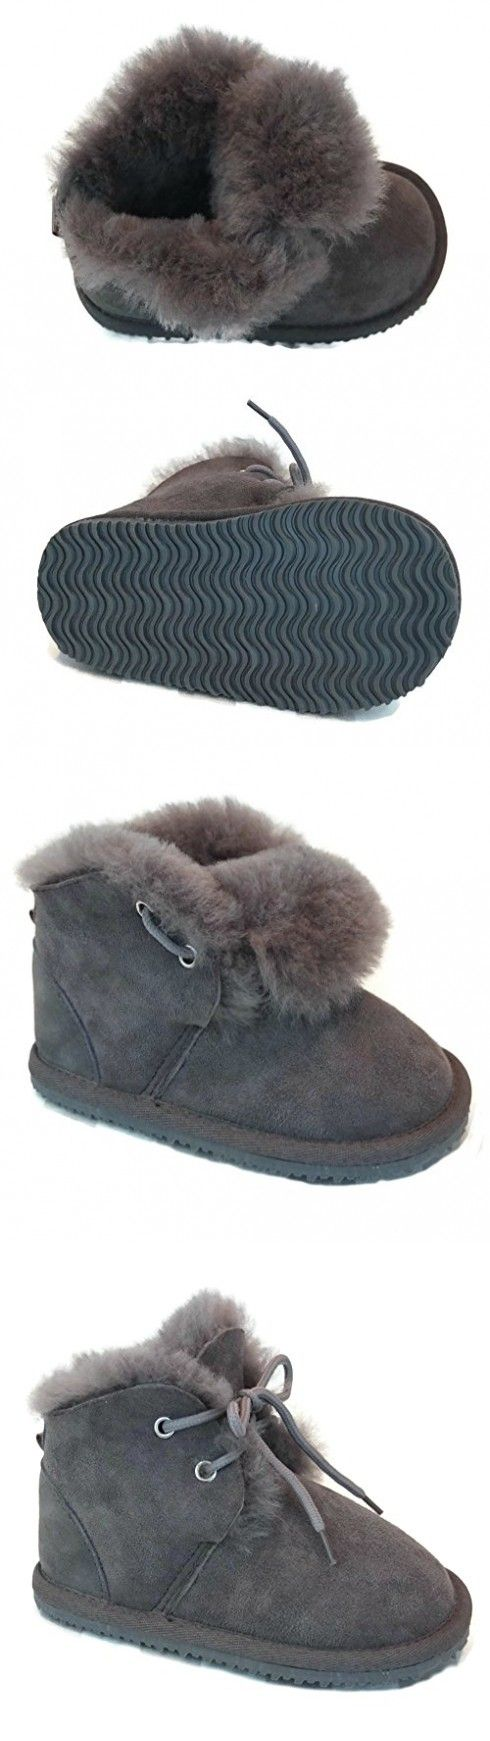 Cool Beans Sheepskin Childrens Warm Fur Winter Snow Boots ( Boys, Girls : Baby / Toddler size 6 )